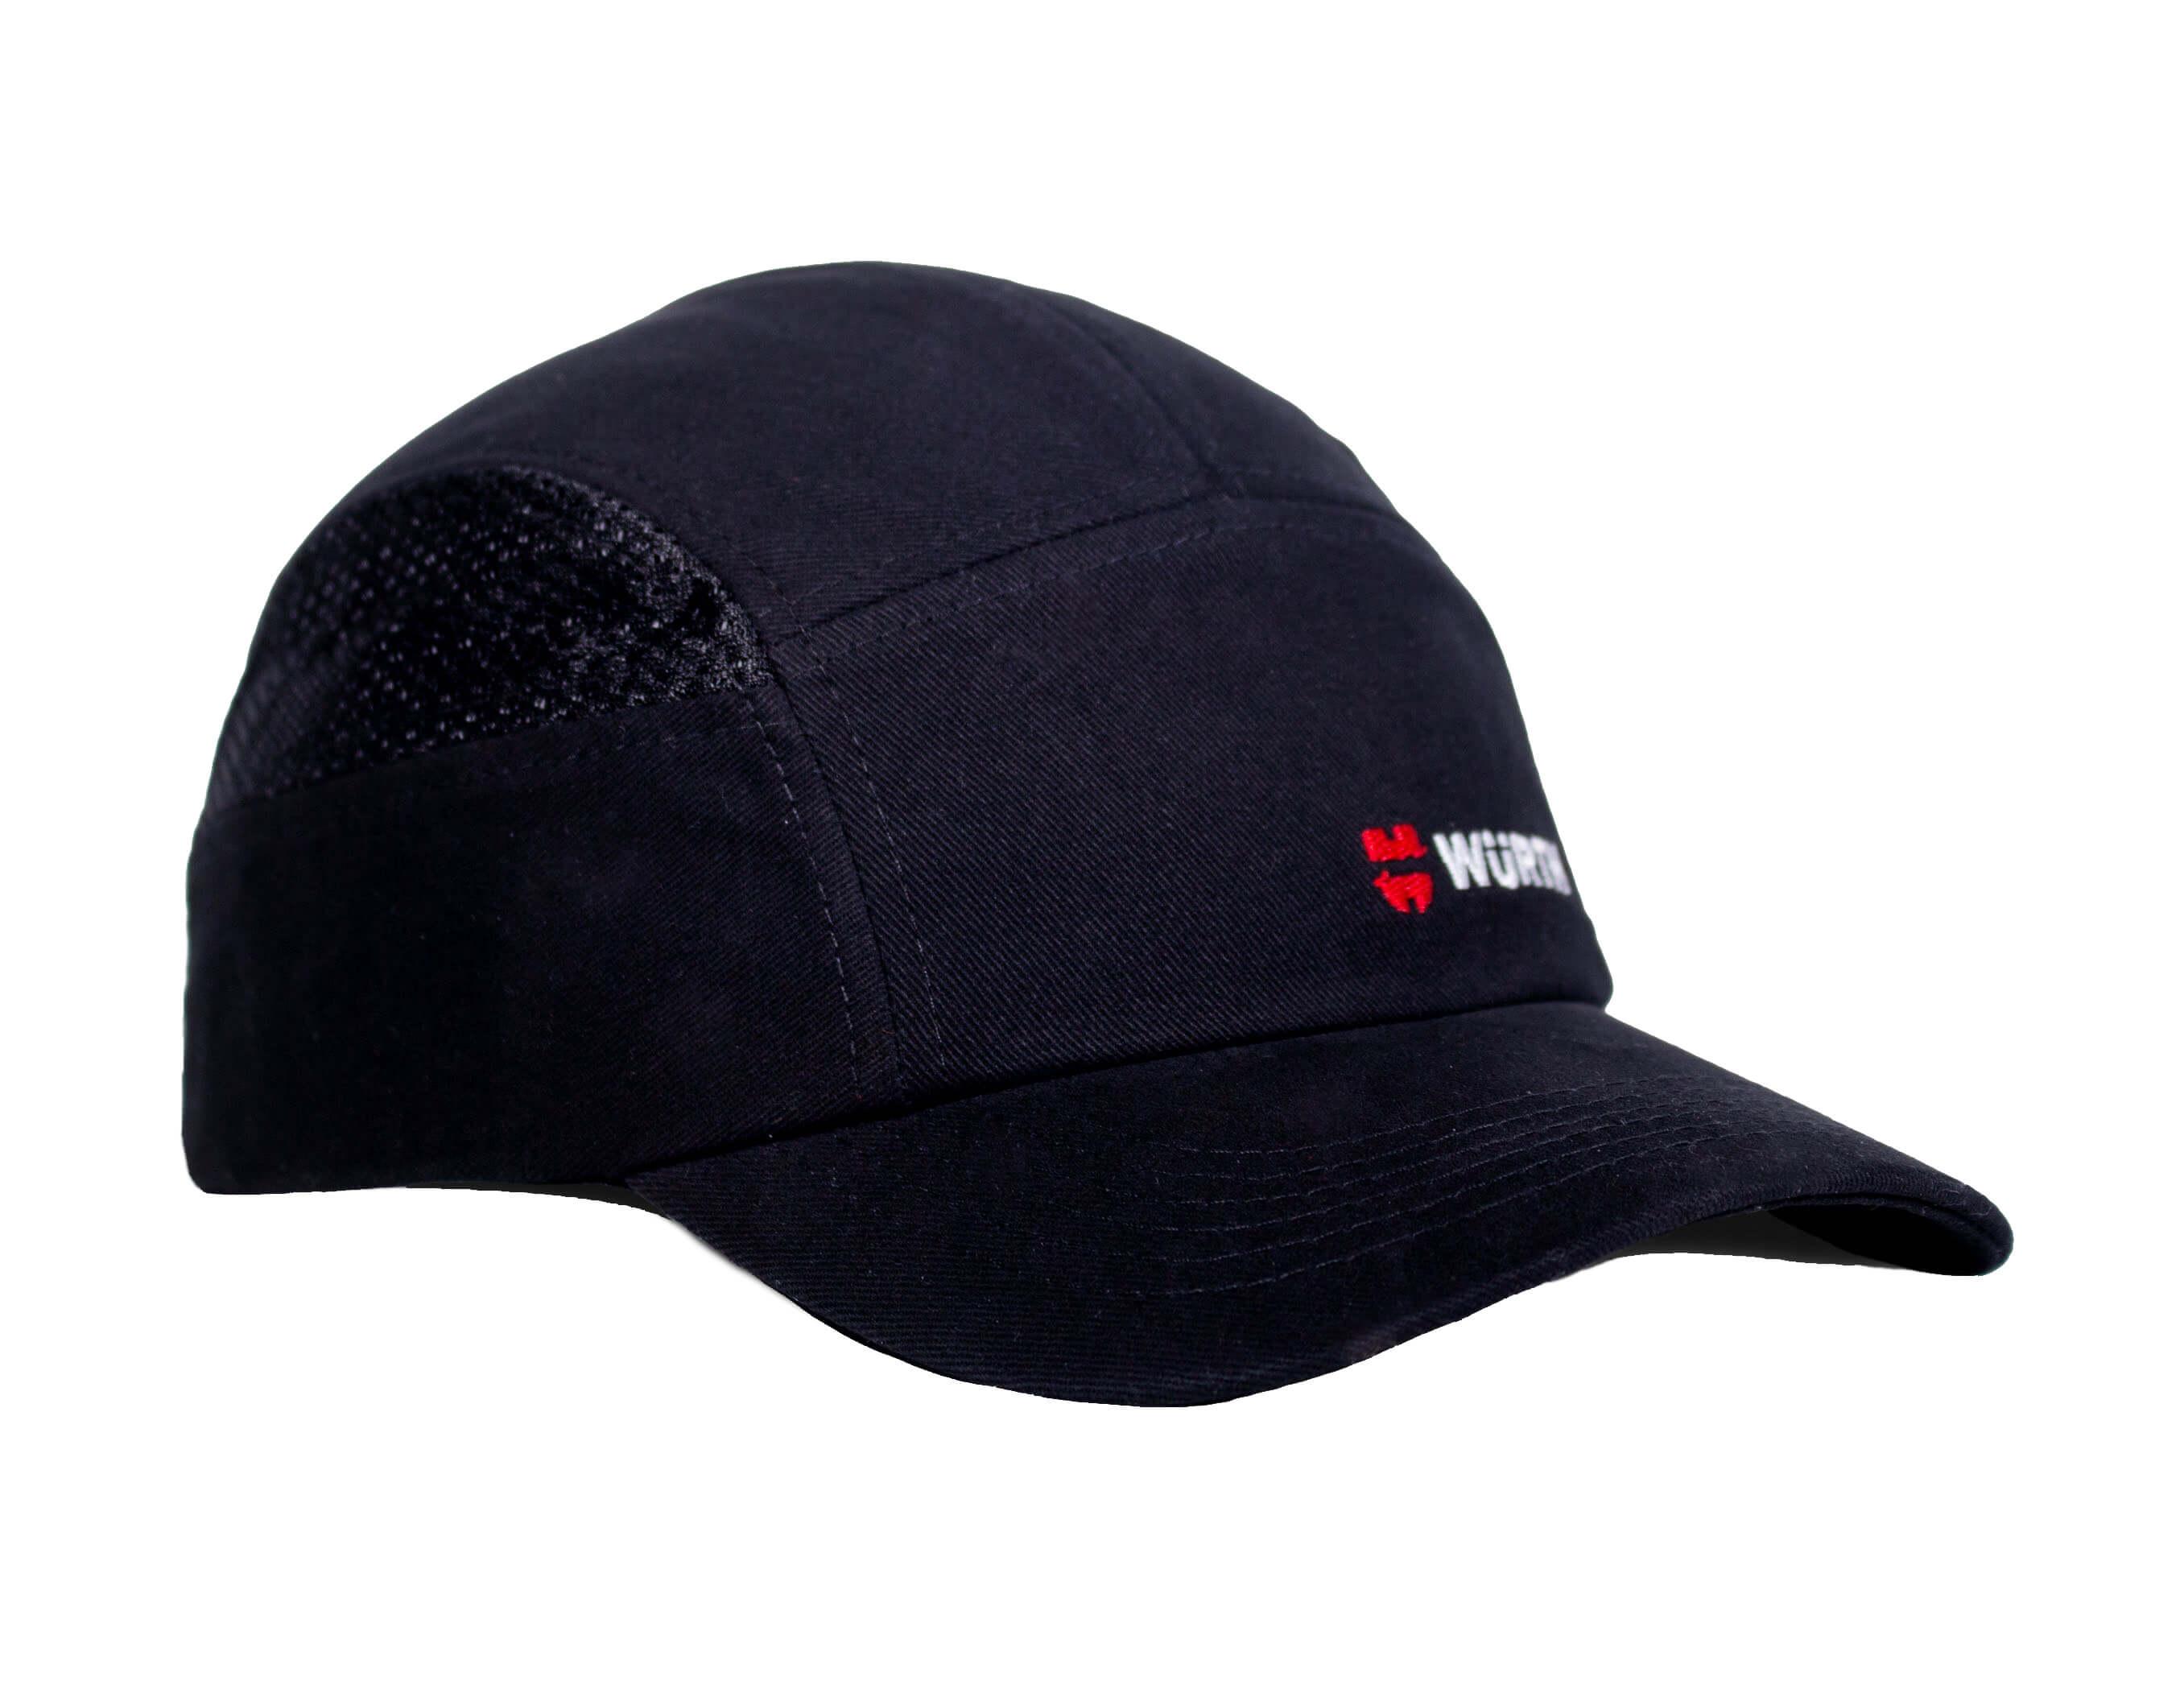 Cool Adjustable Strapback Hat Wankens Unisex Casual Baseball Cap Mauser-Logo